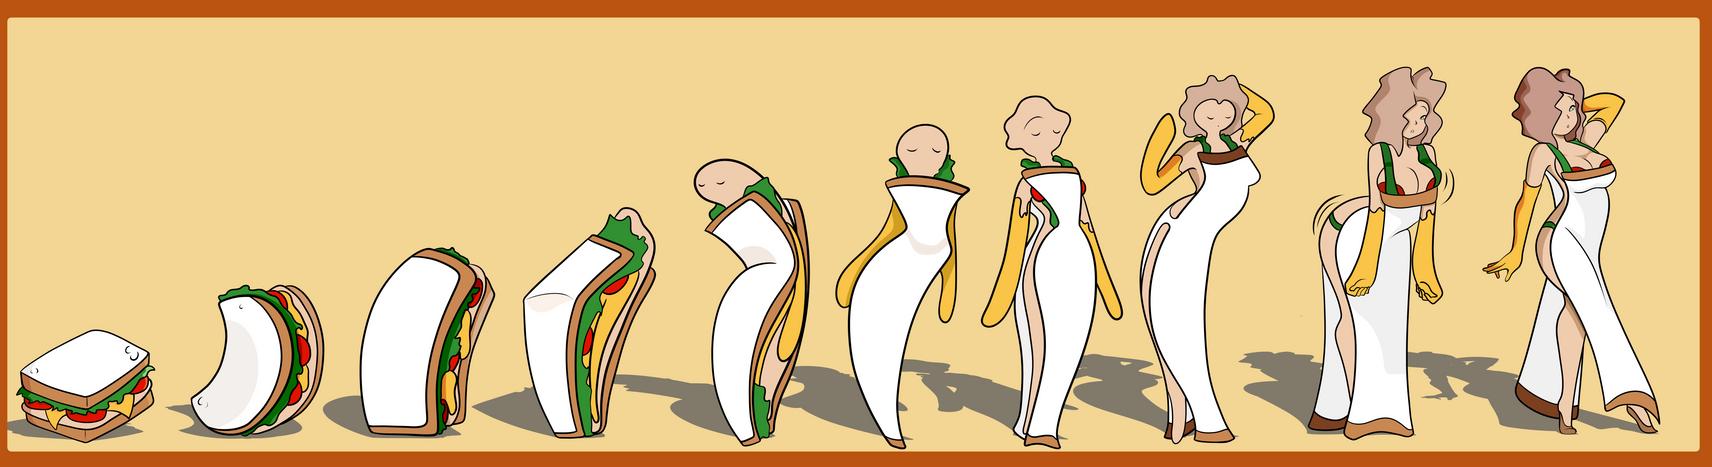 Sandwich To Woman by ChompWorks